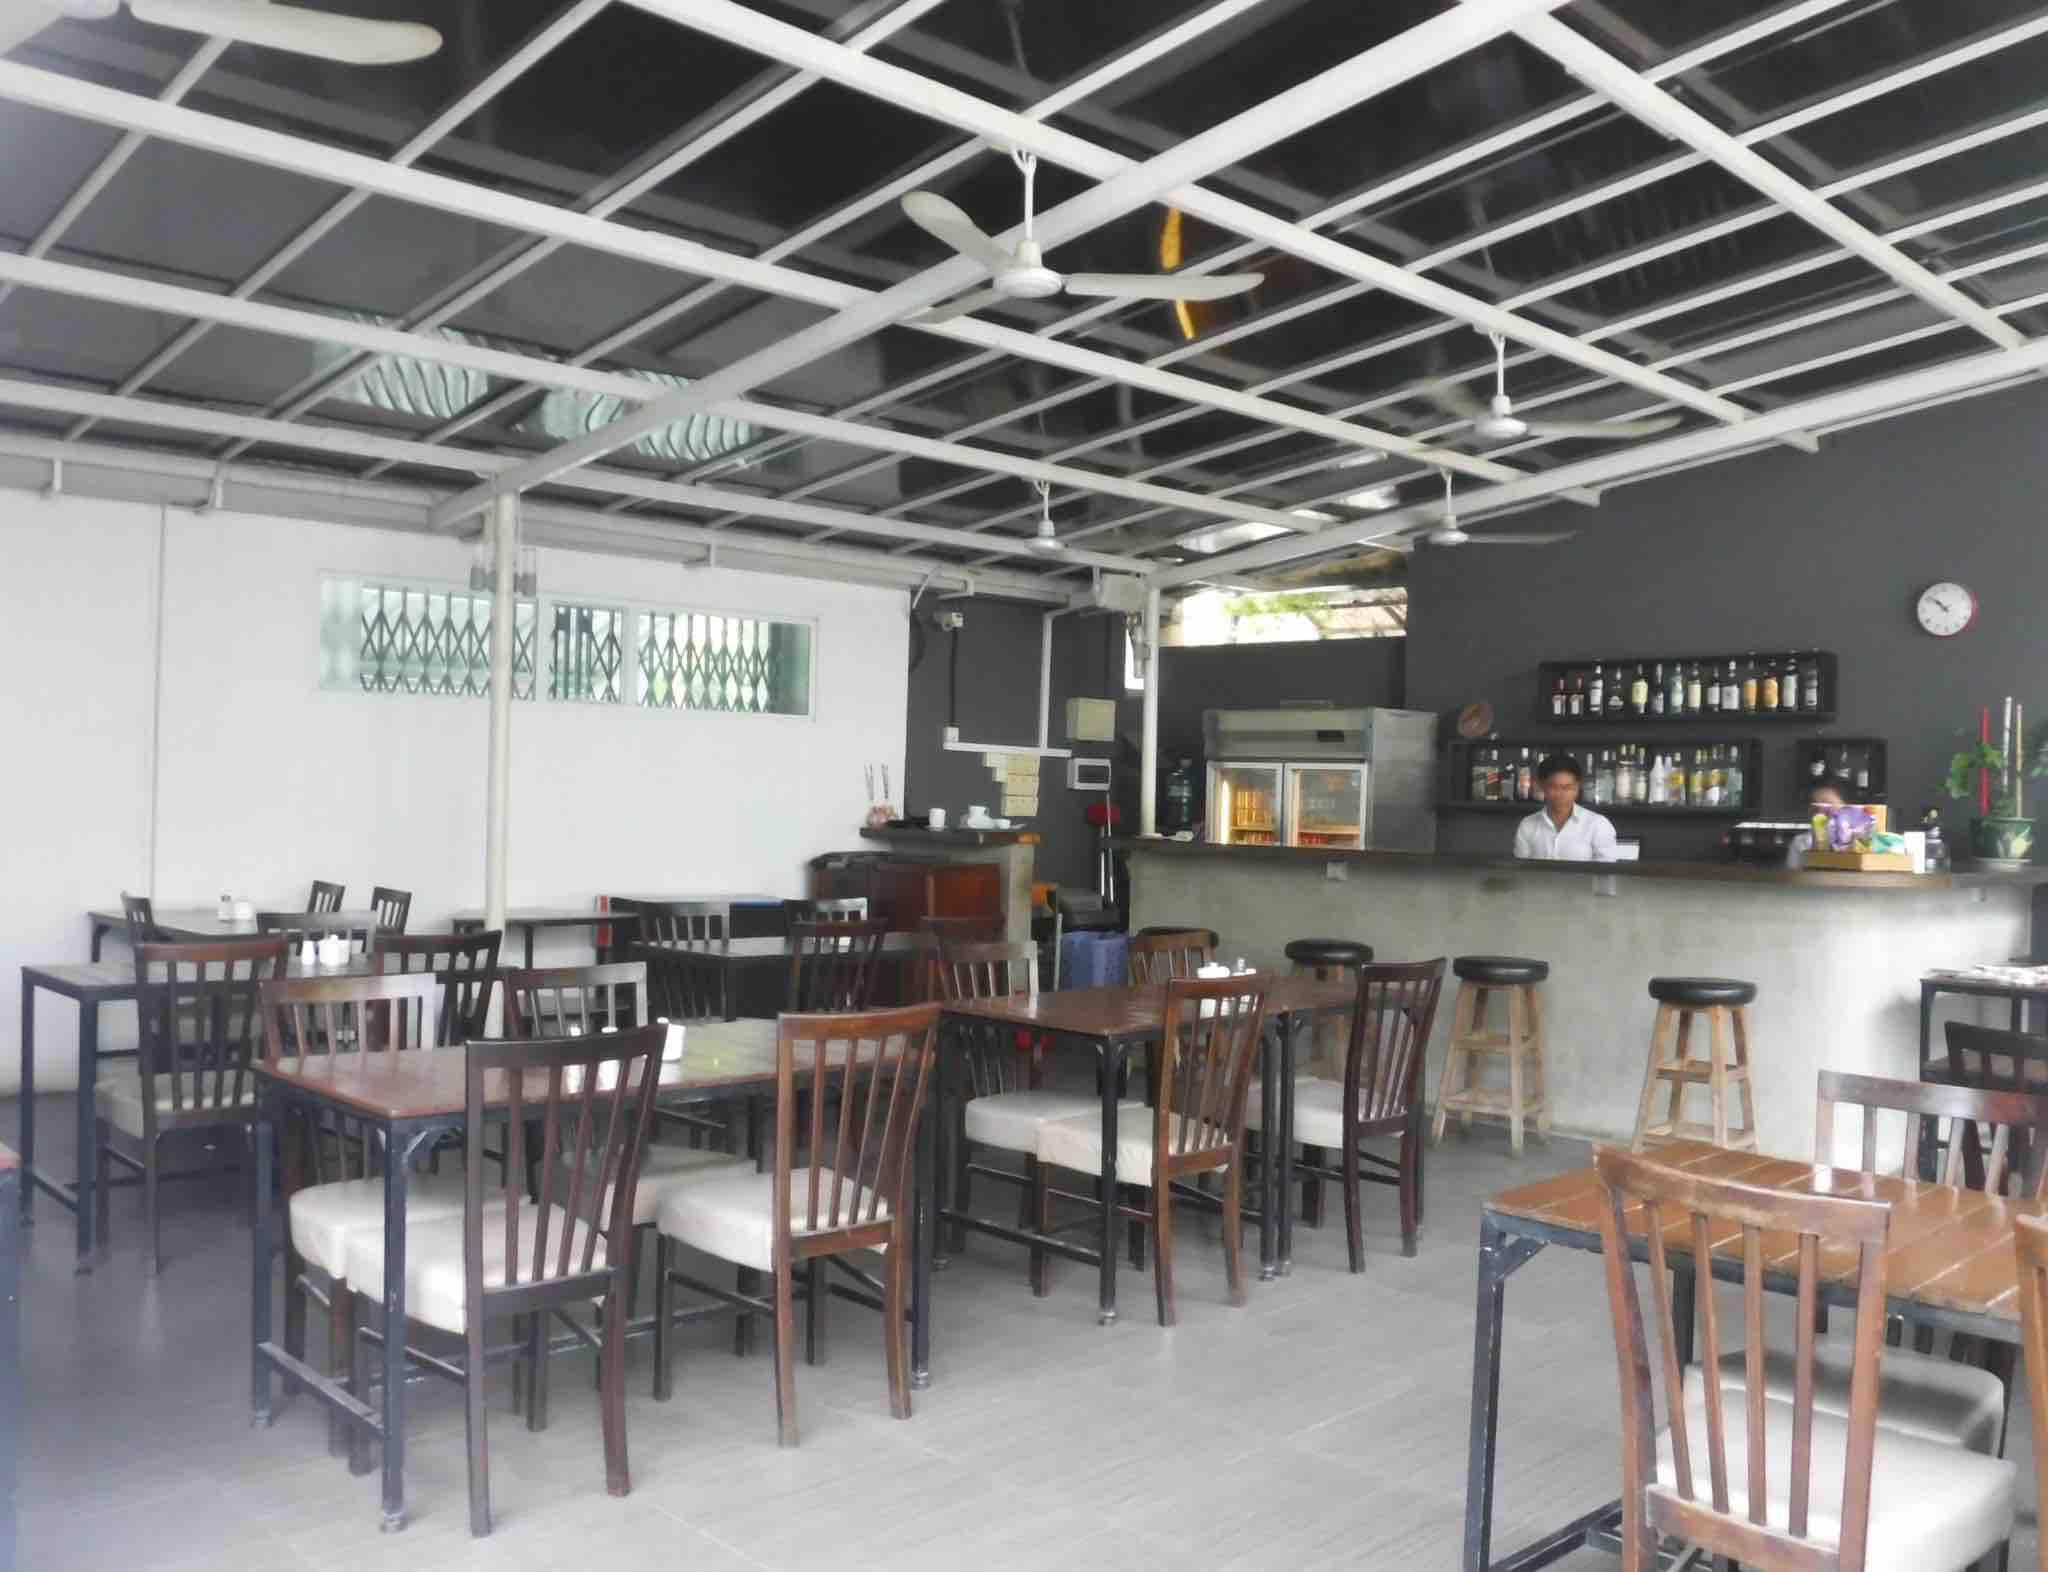 The Billabong Hotel - The Restaurant